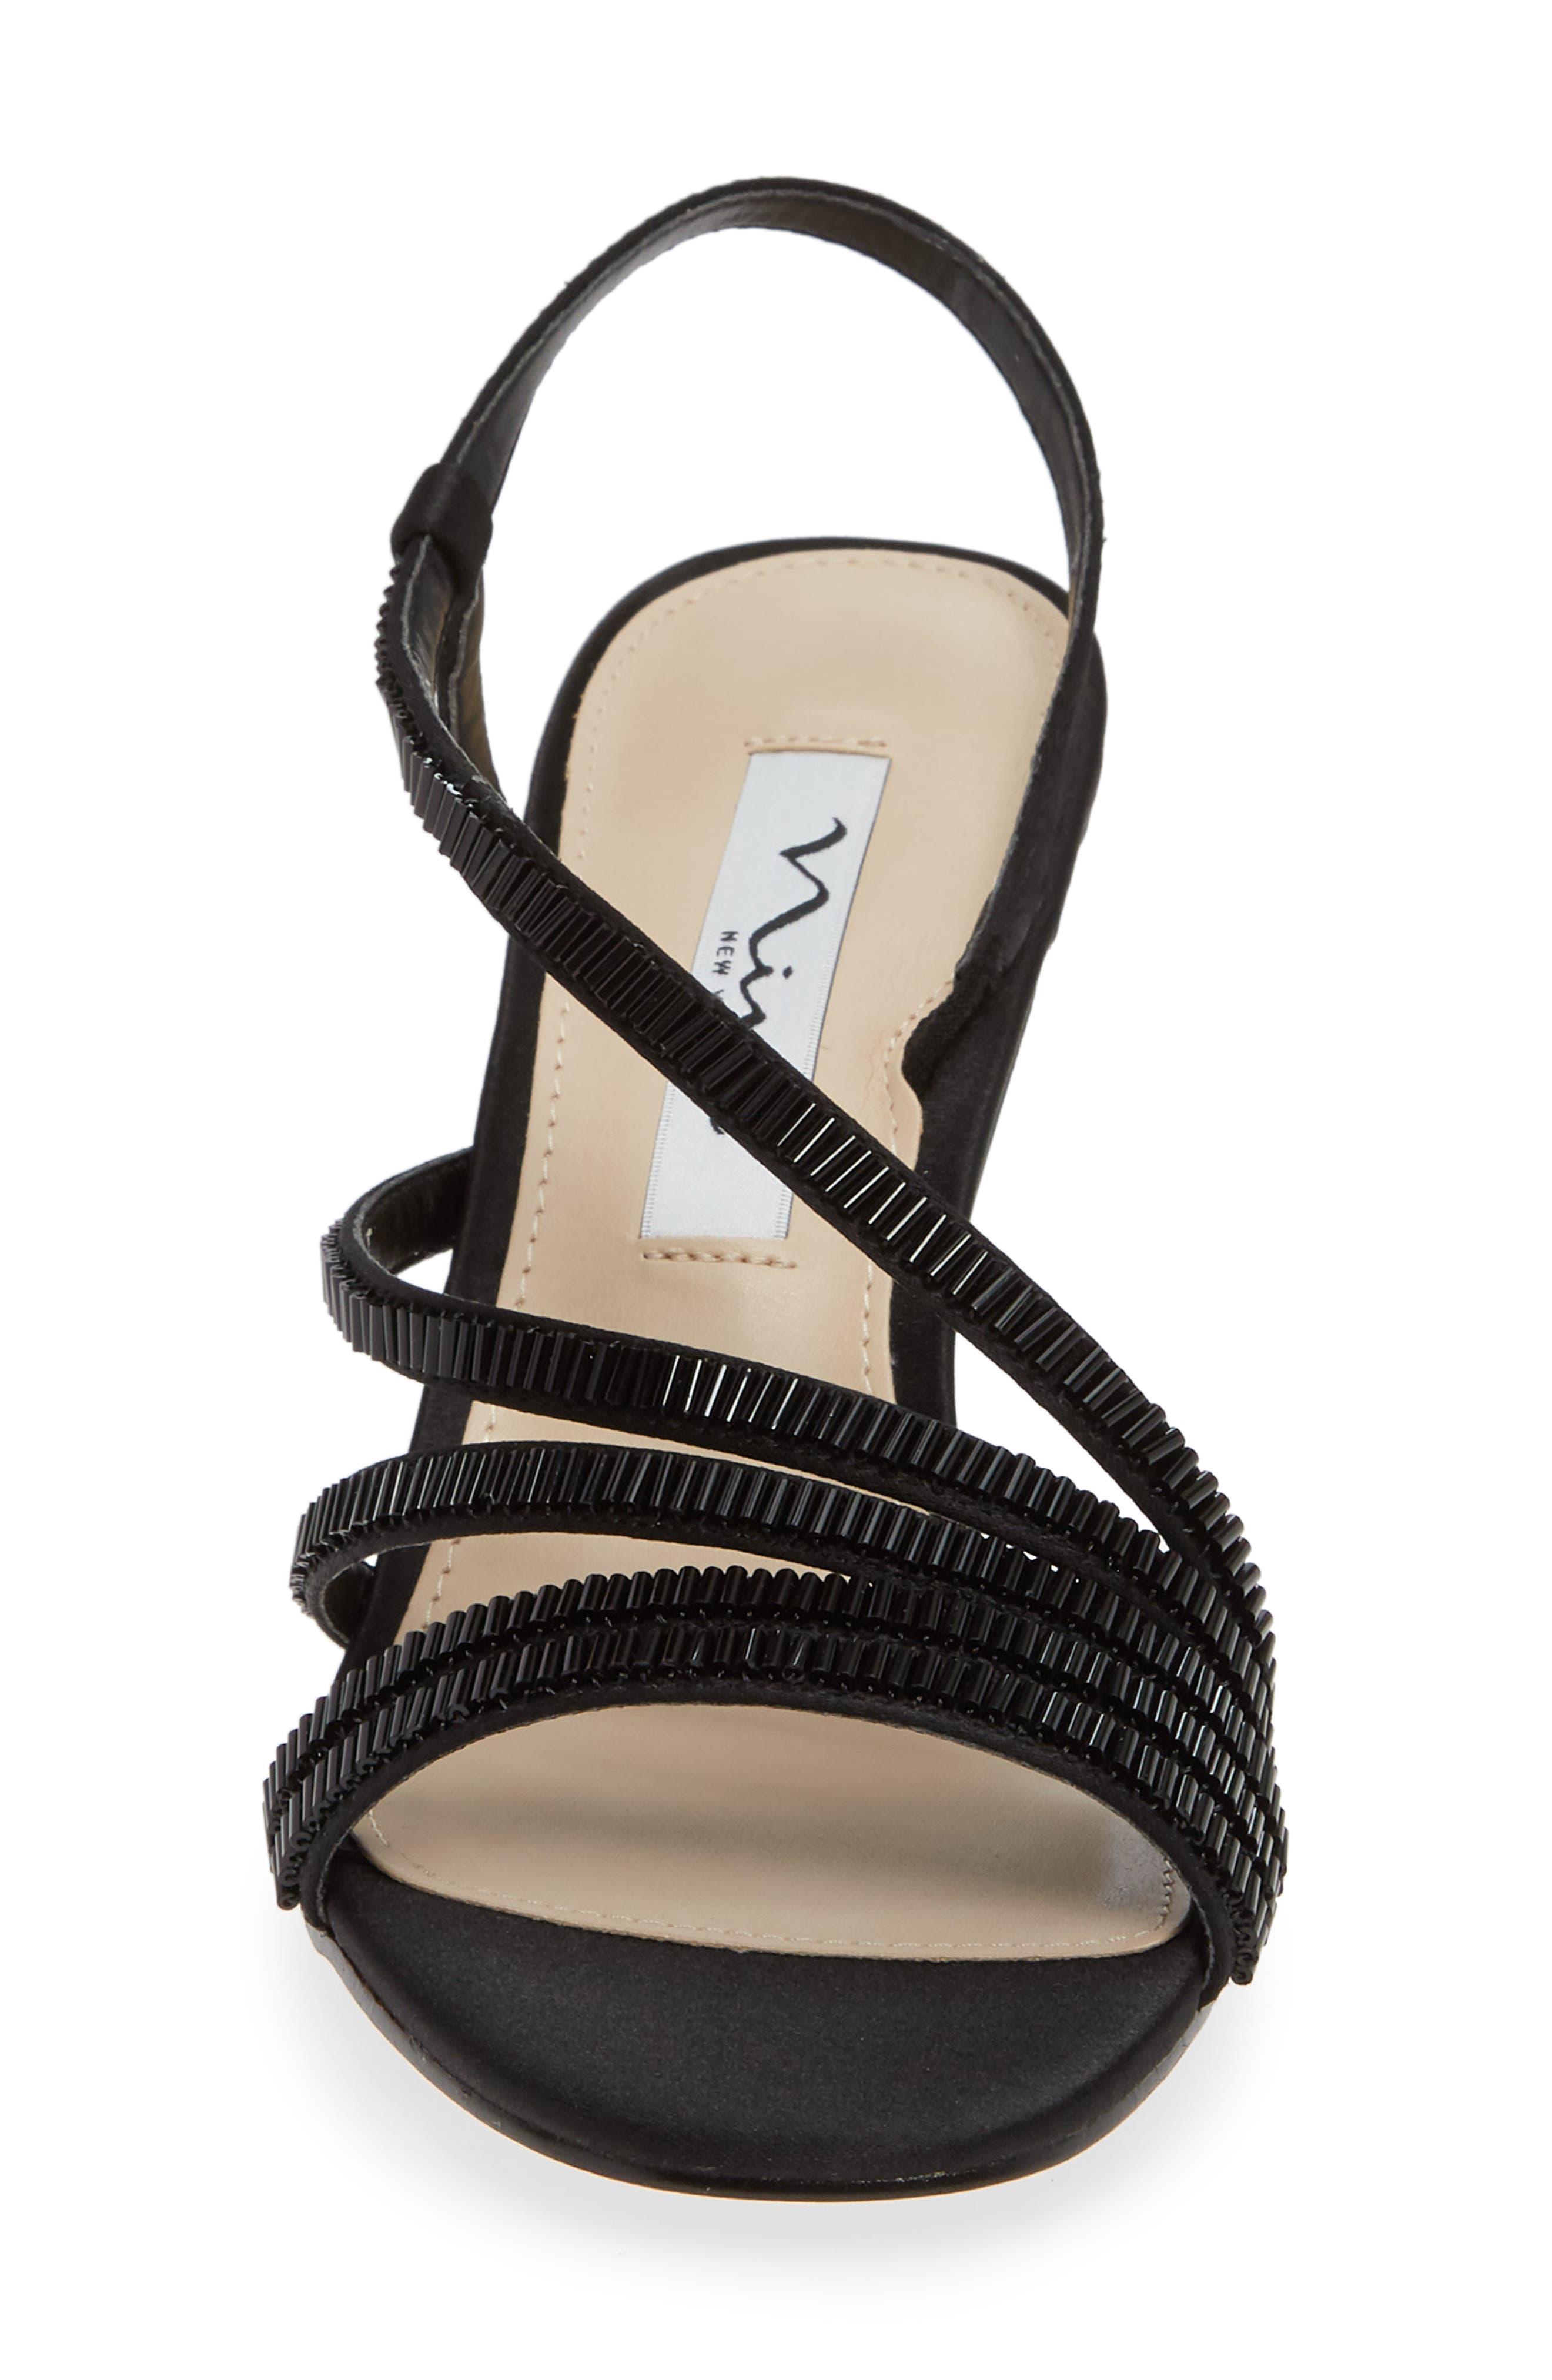 Amani Asymmetrical Strappy Slingback Sandal,                             Alternate thumbnail 4, color,                             003